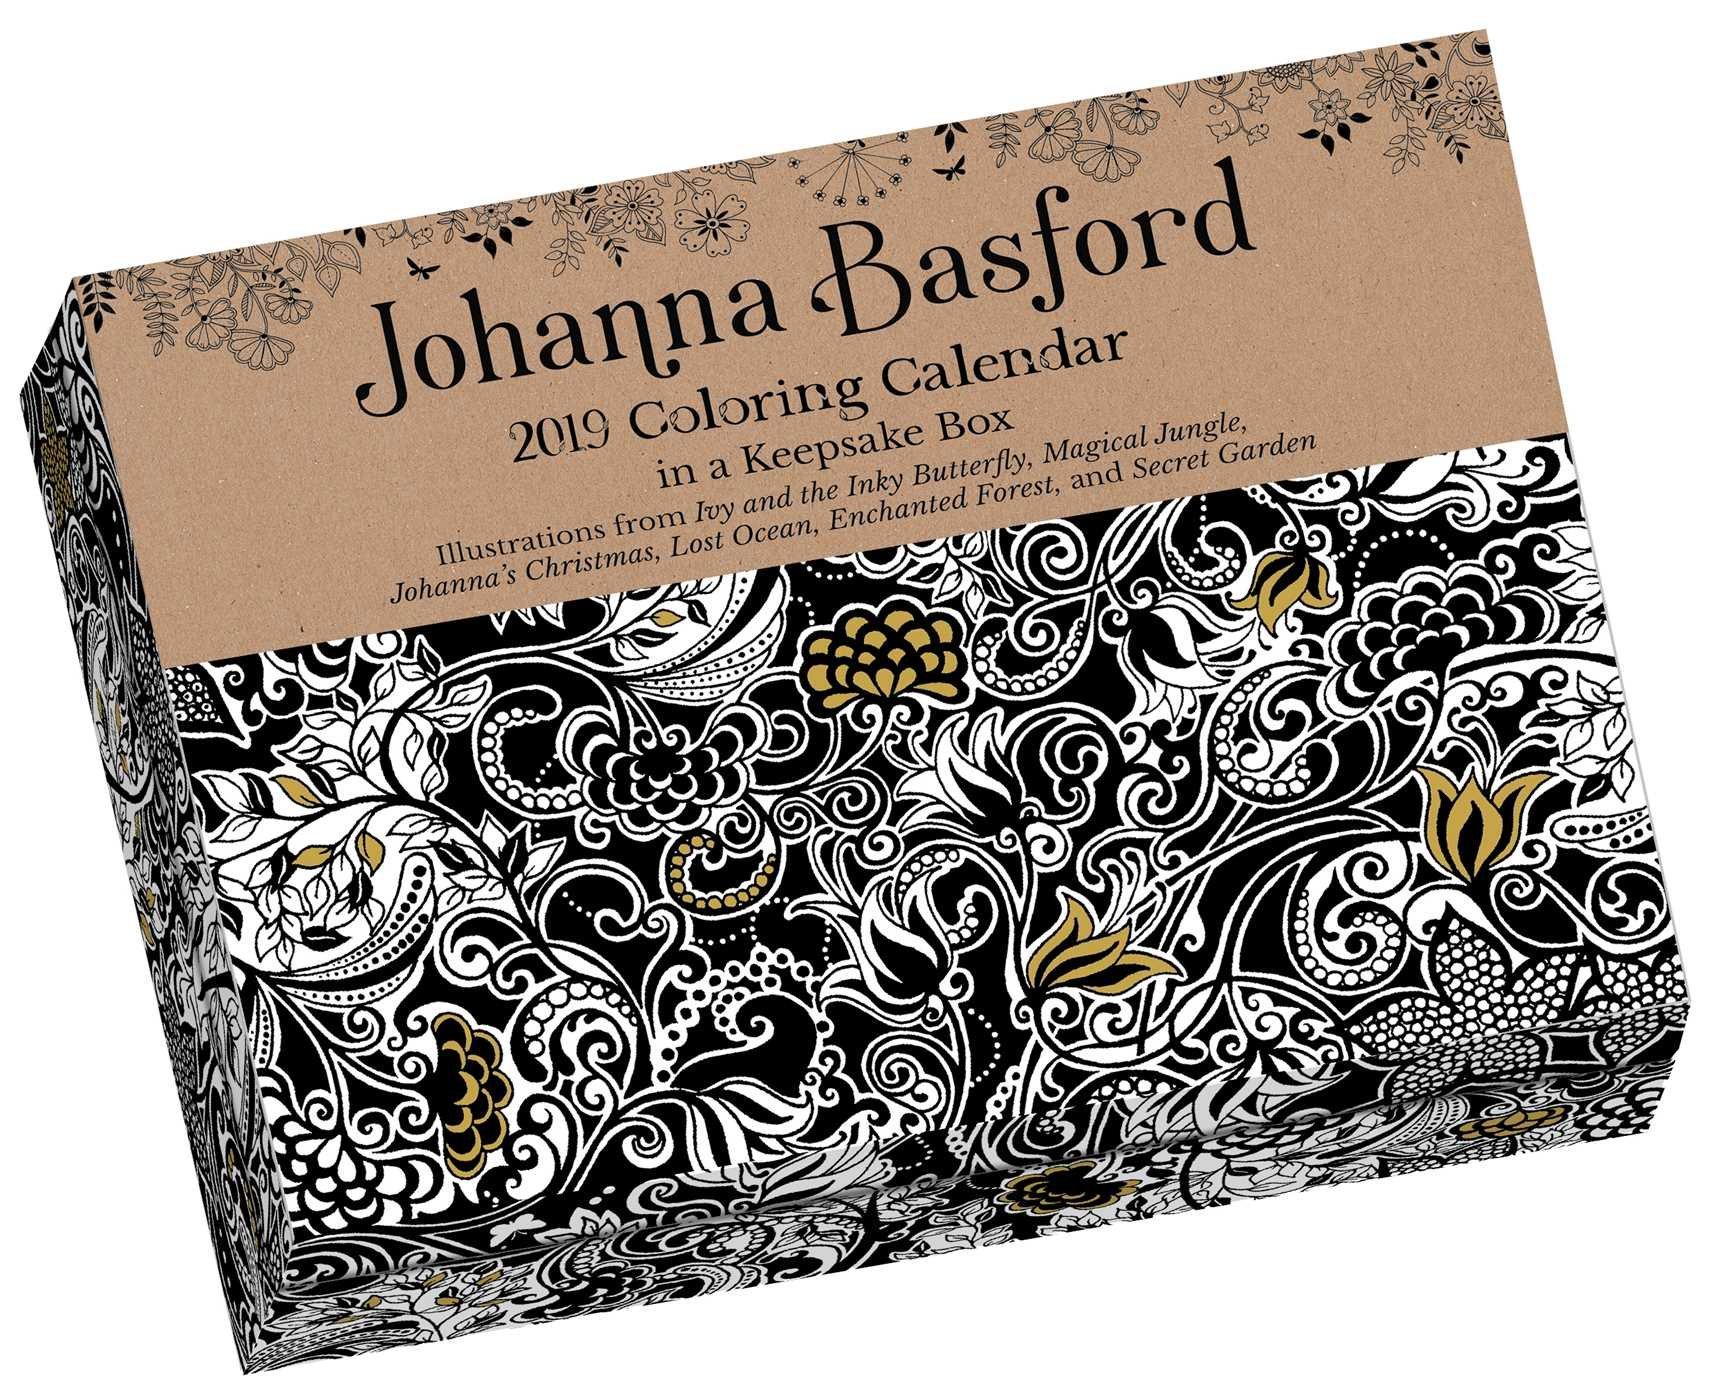 johanna basford 2019 coloring day to day calendar johanna basford 9781449492434 amazoncom books